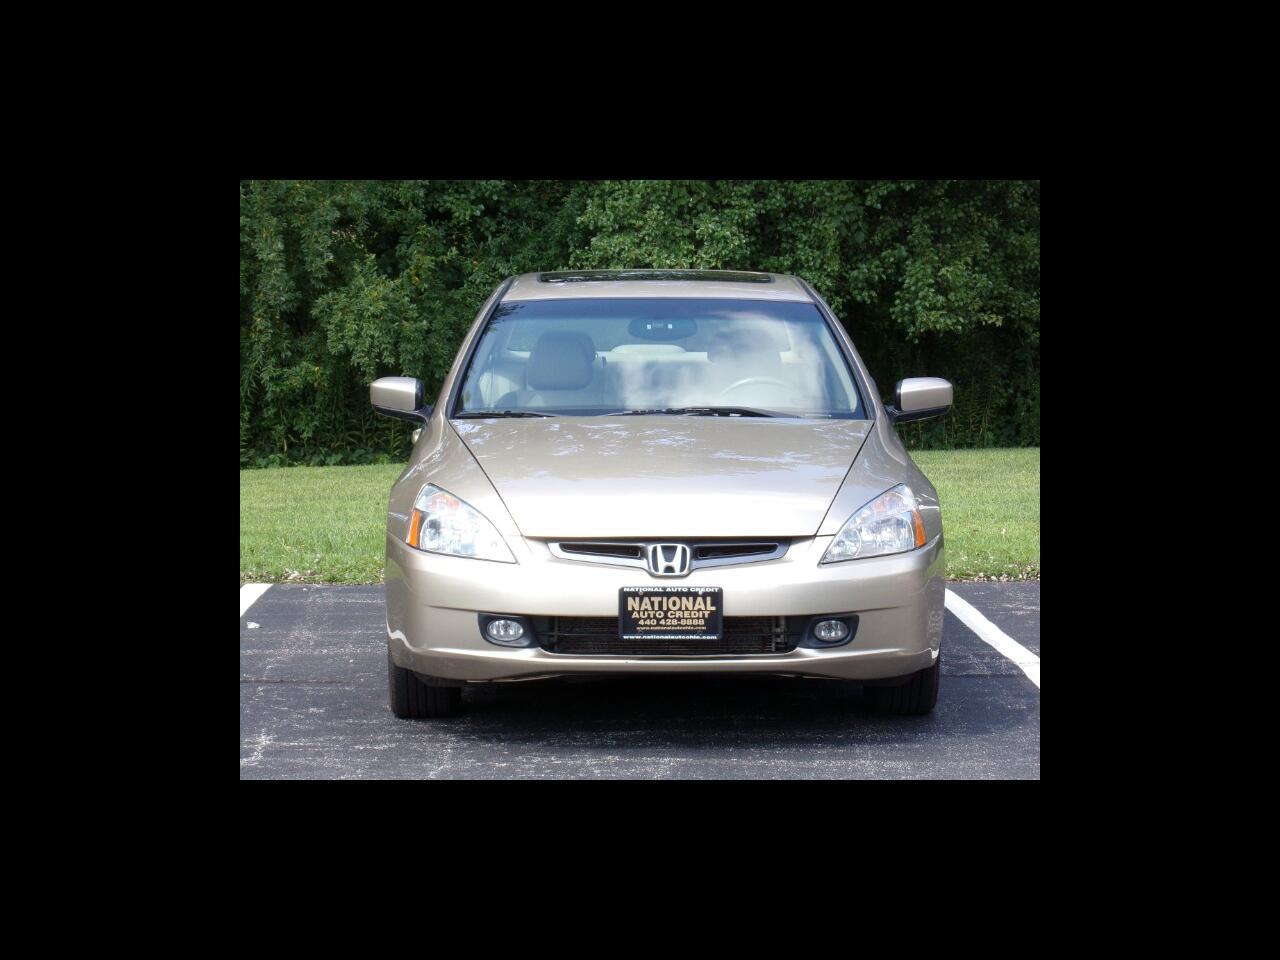 Honda Accord EX V-6 Sedan AT with Navigation System and XM Radi 2004